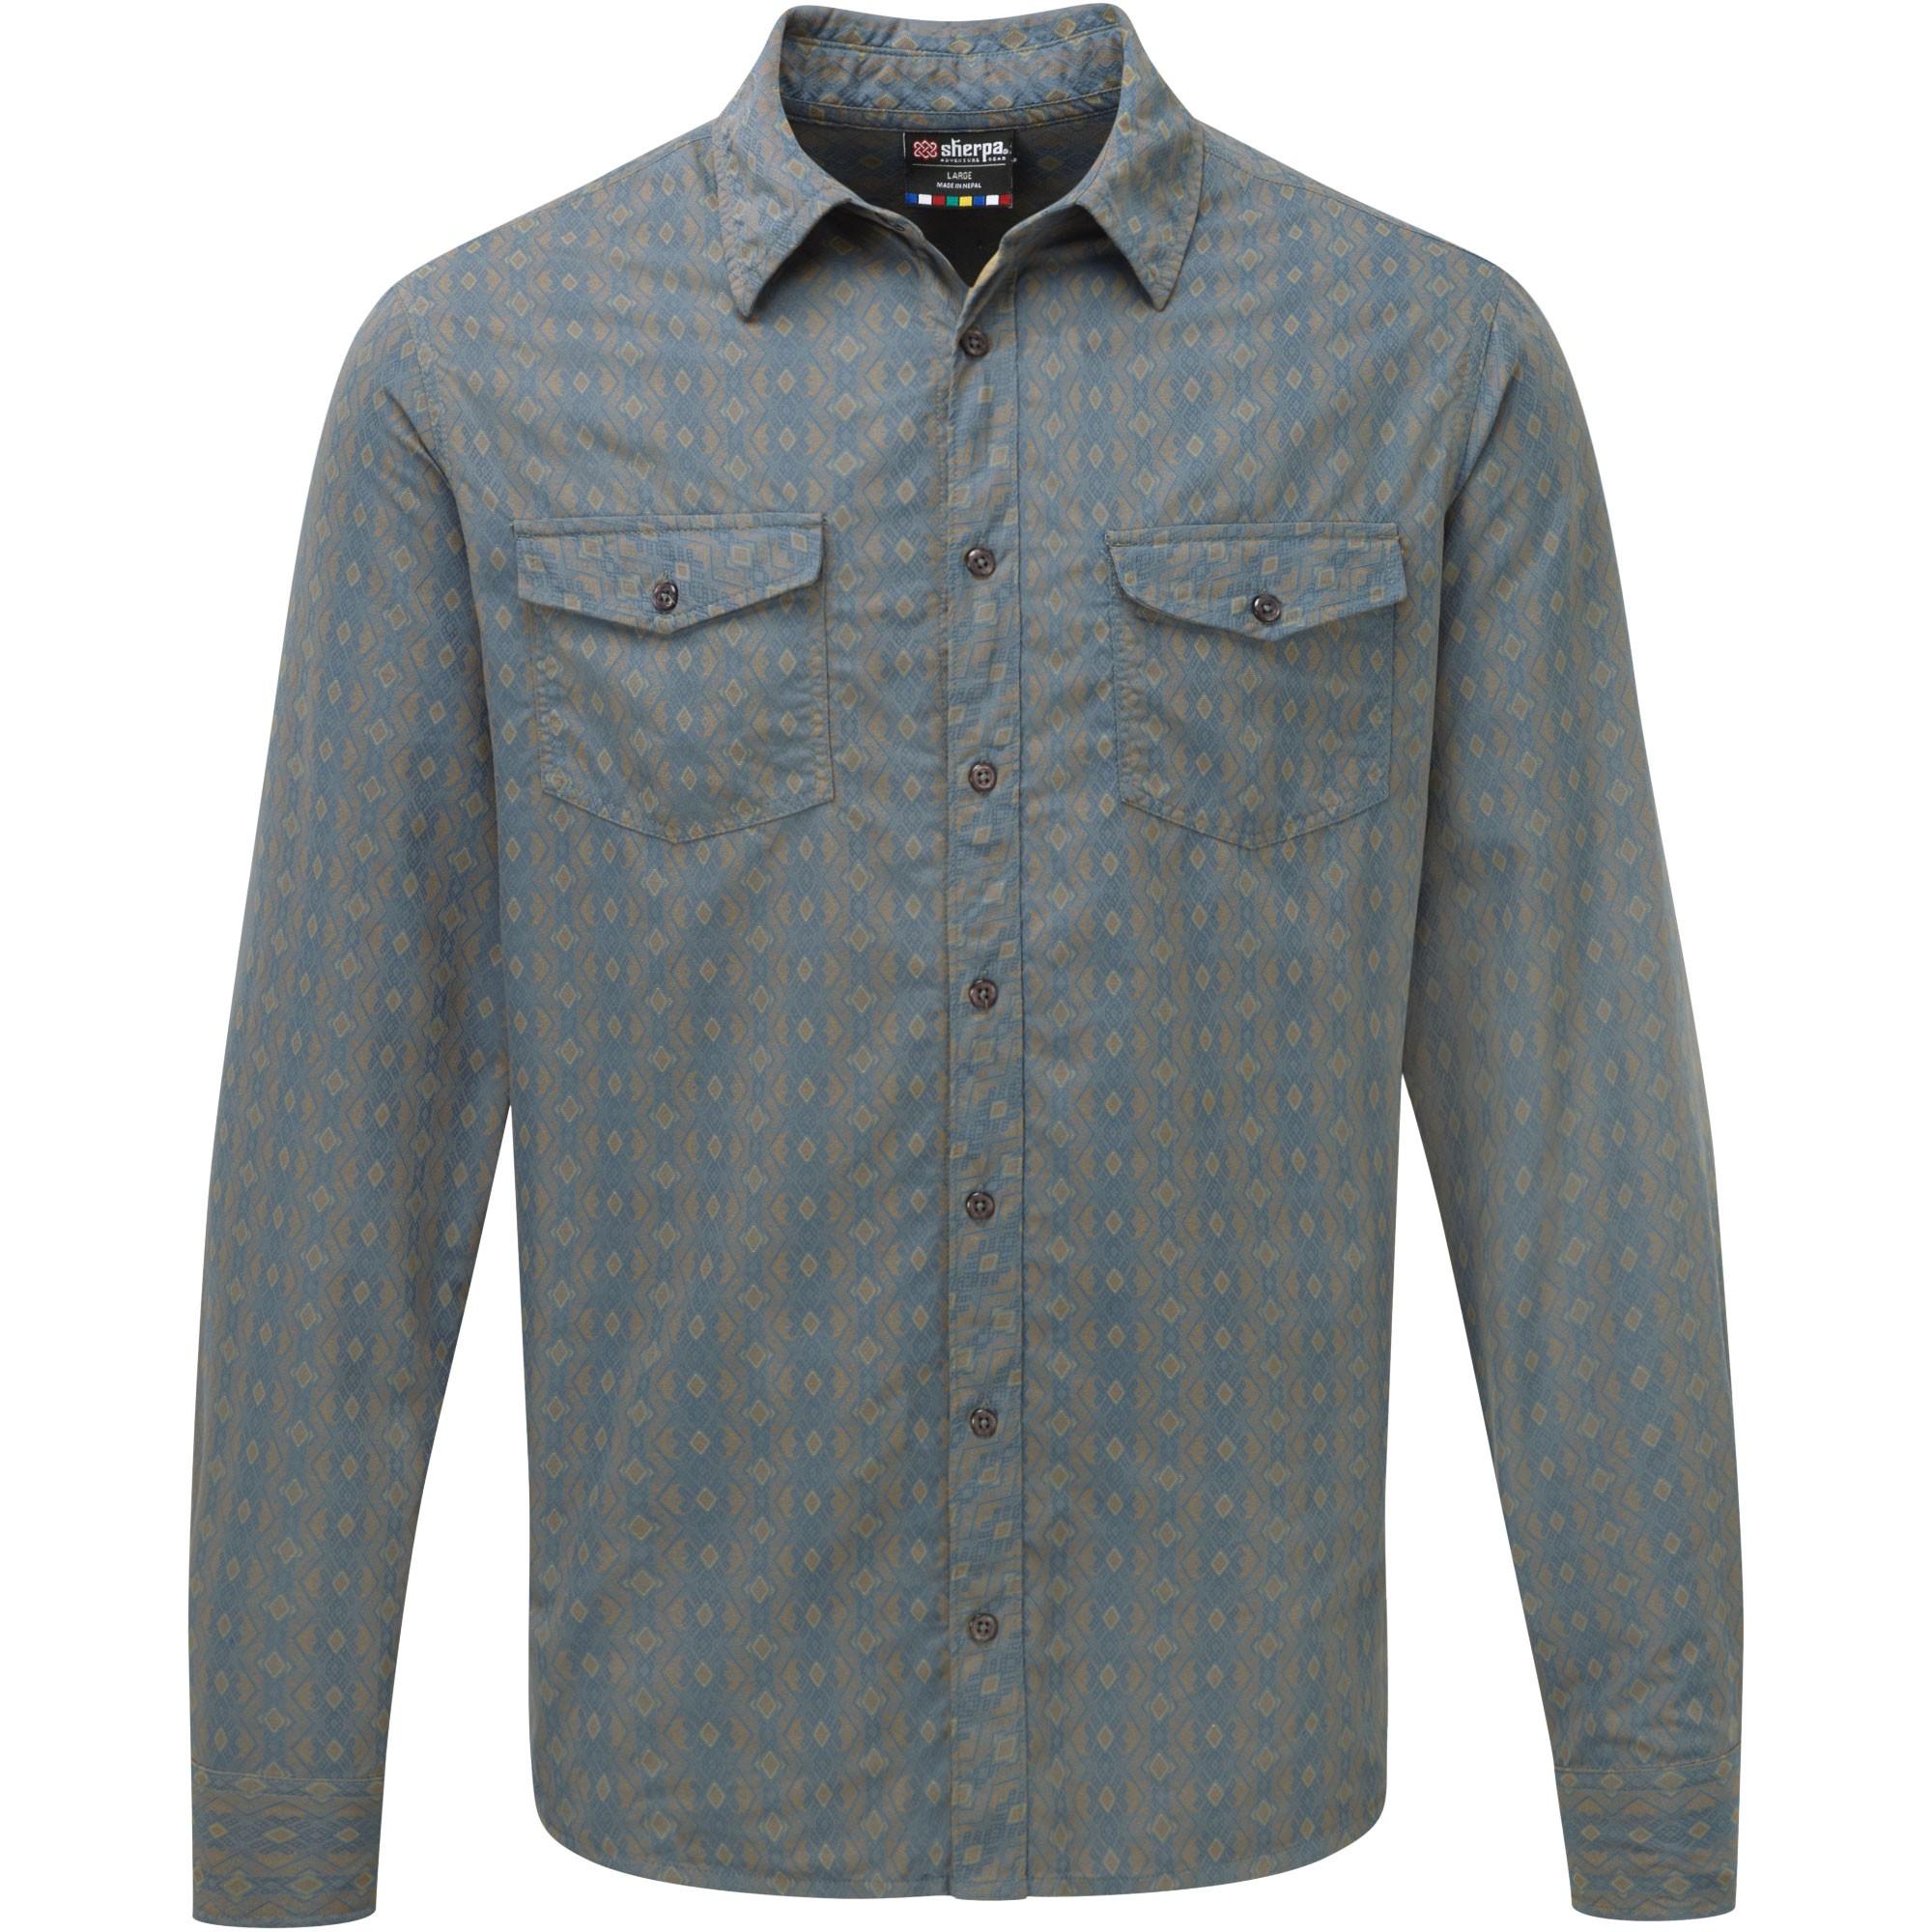 SHERPA - Surya Long Sleeve Shirt